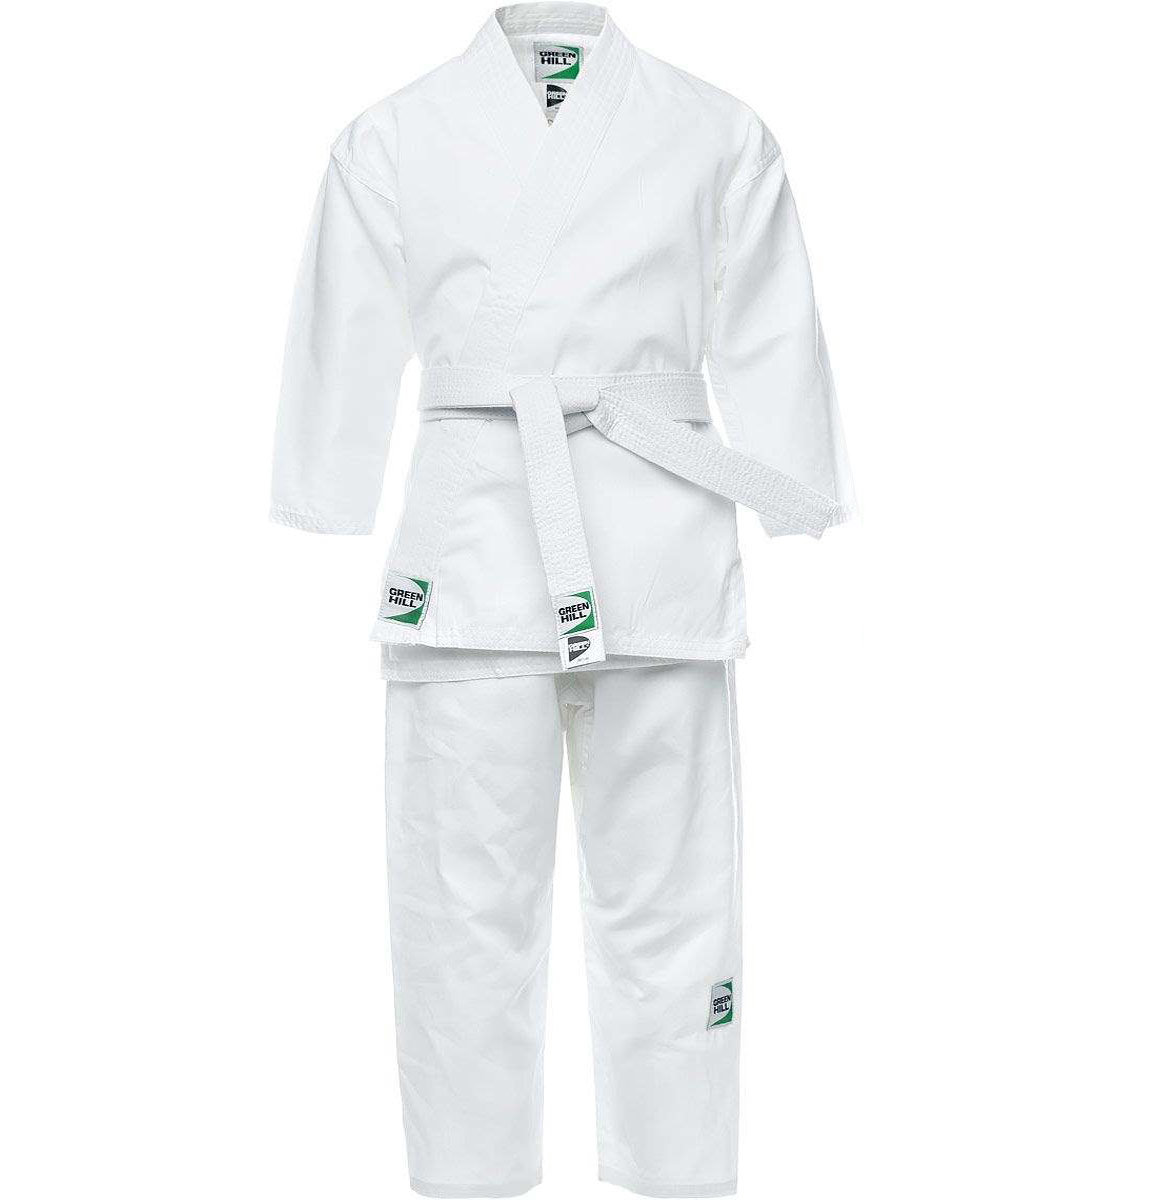 Кимоно для айкидо Green Hill AKS-10495, 160, белый, для разного уровня, хлопок - 65%, полиэстер - 35%